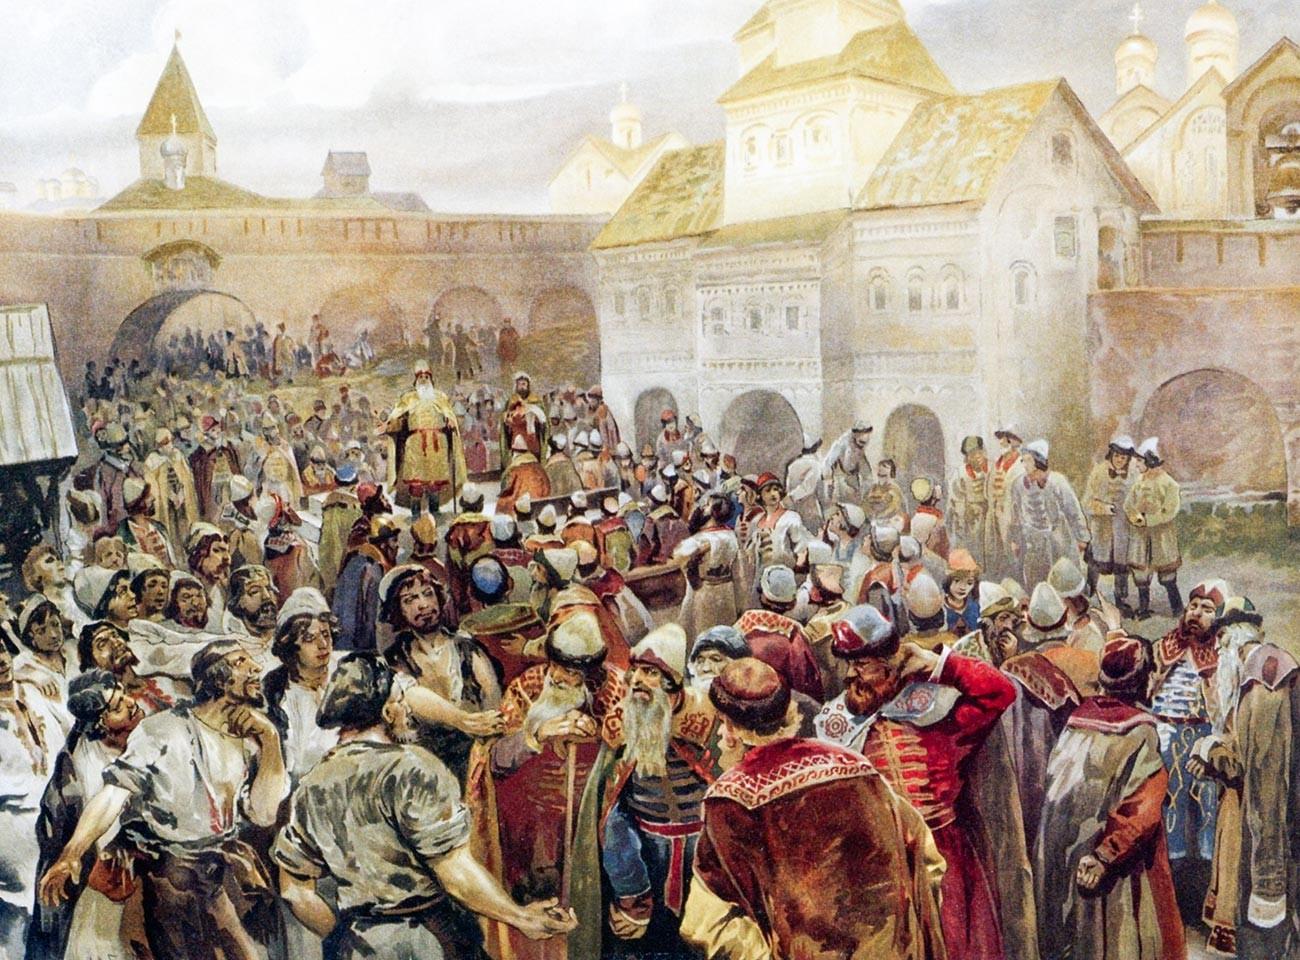 Consiglio a Novgorod